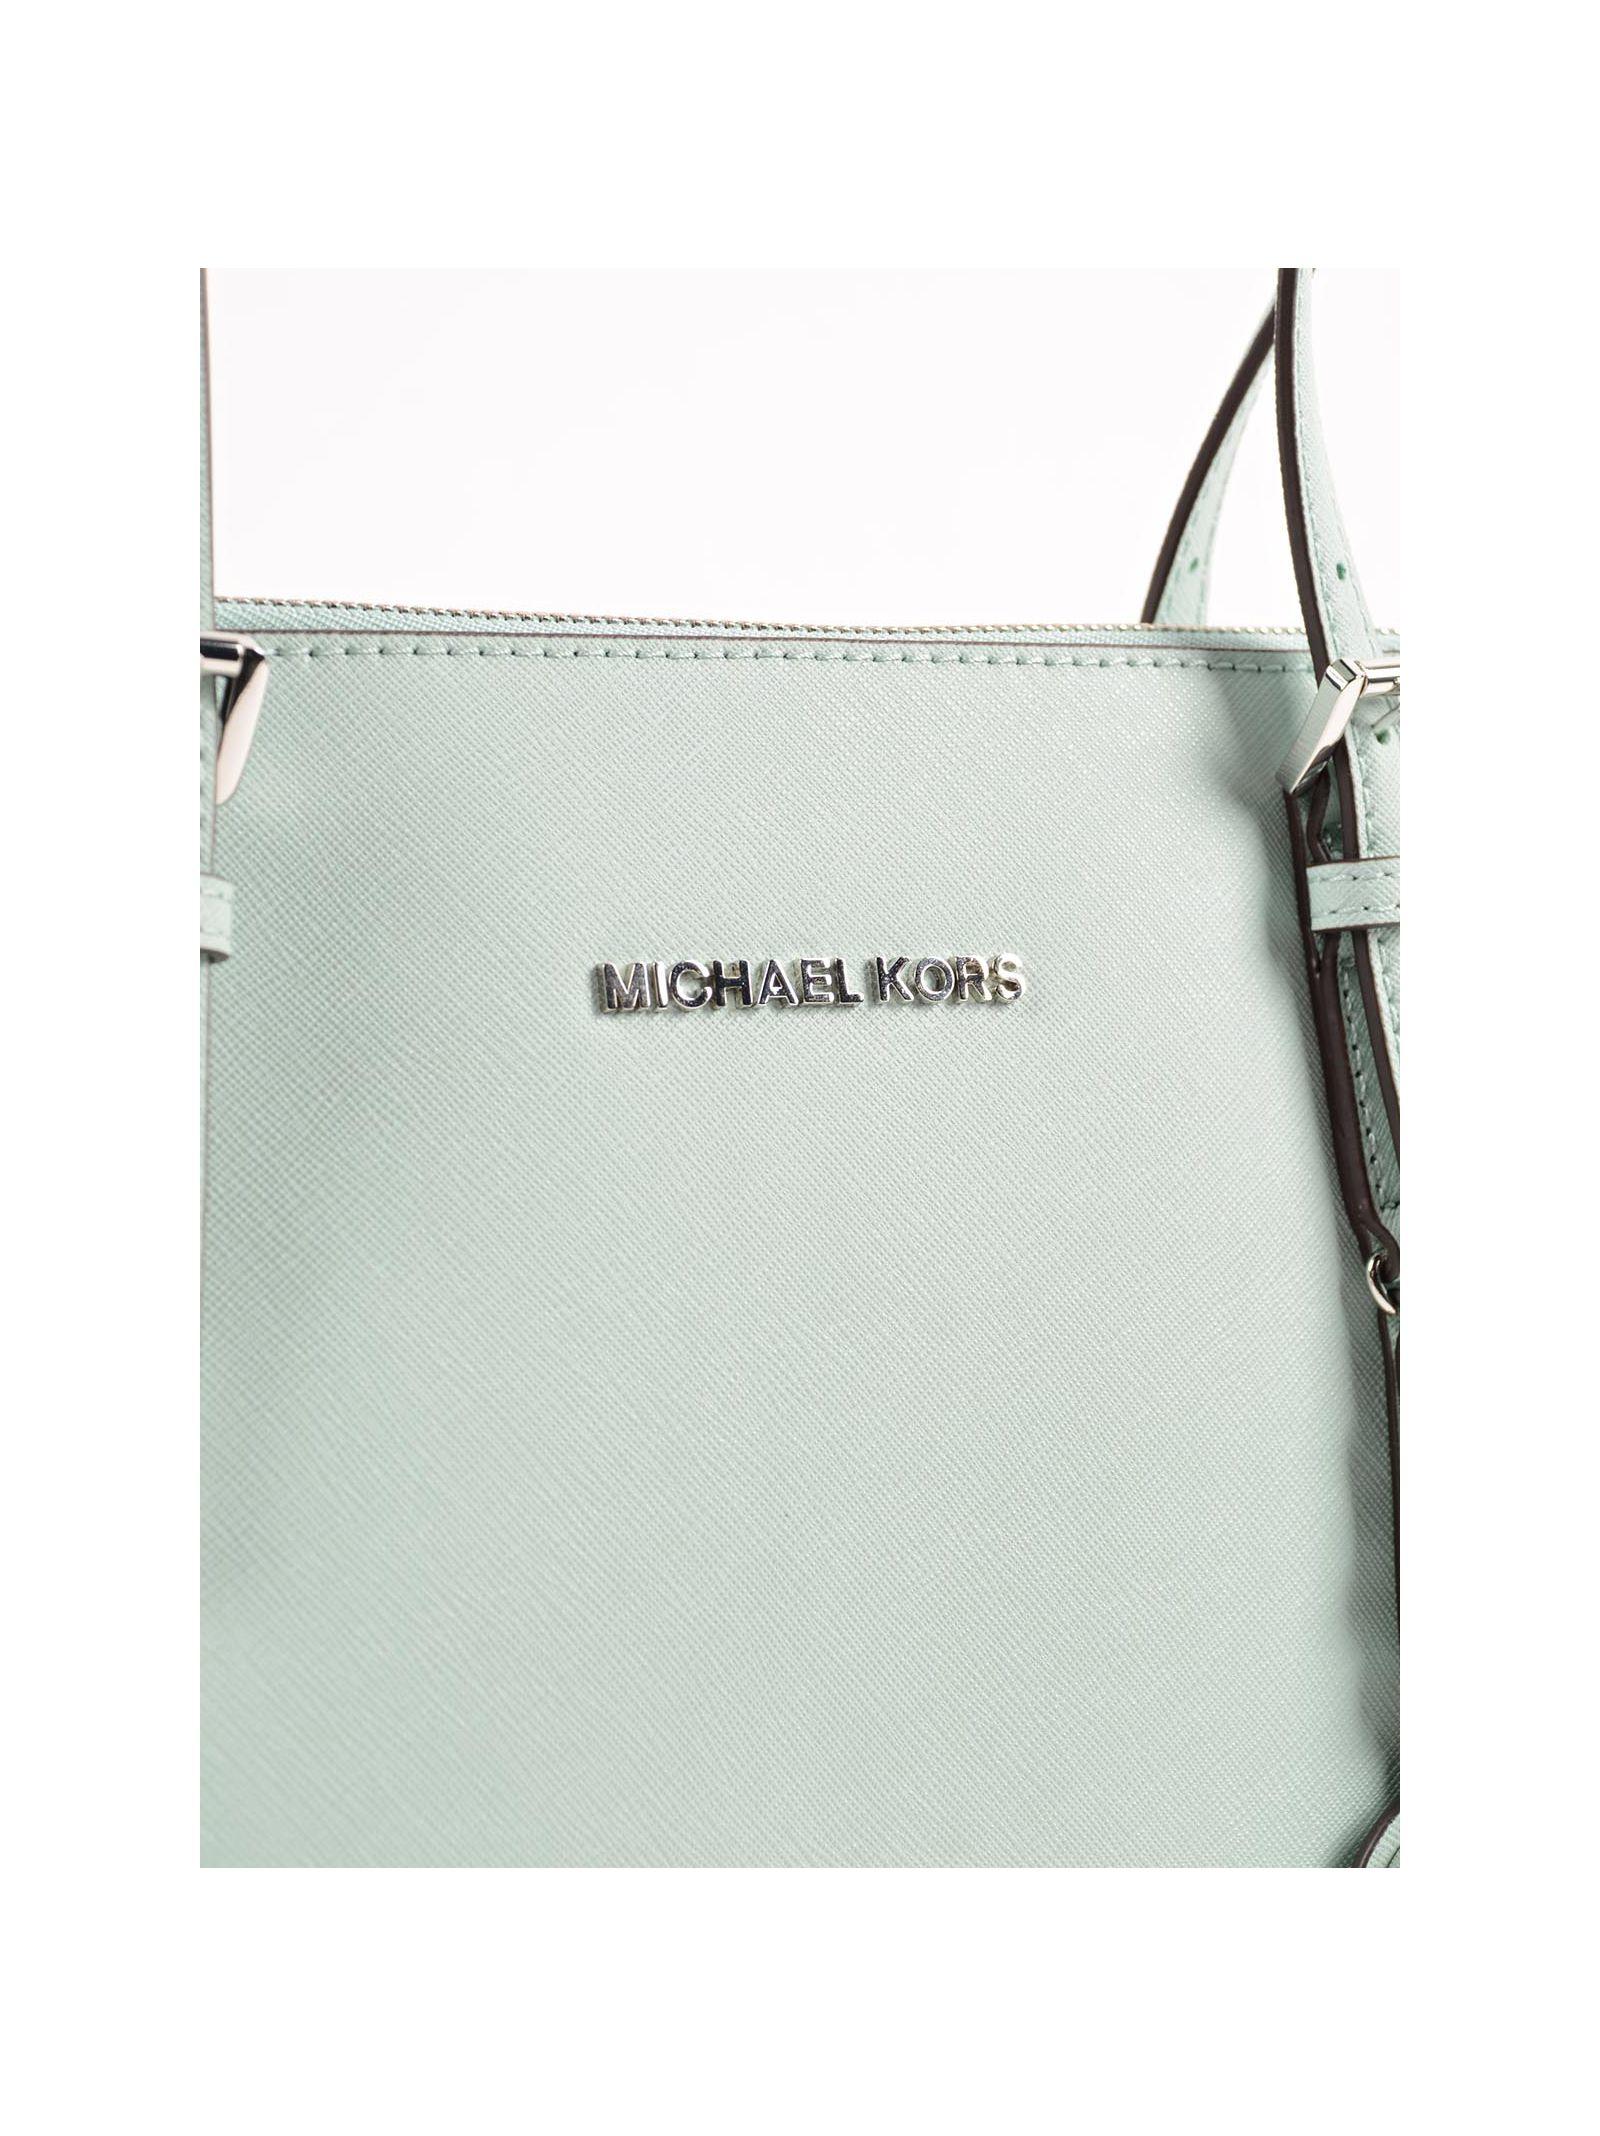 michael kors jet set item ew tz tote in white celadon lyst. Black Bedroom Furniture Sets. Home Design Ideas